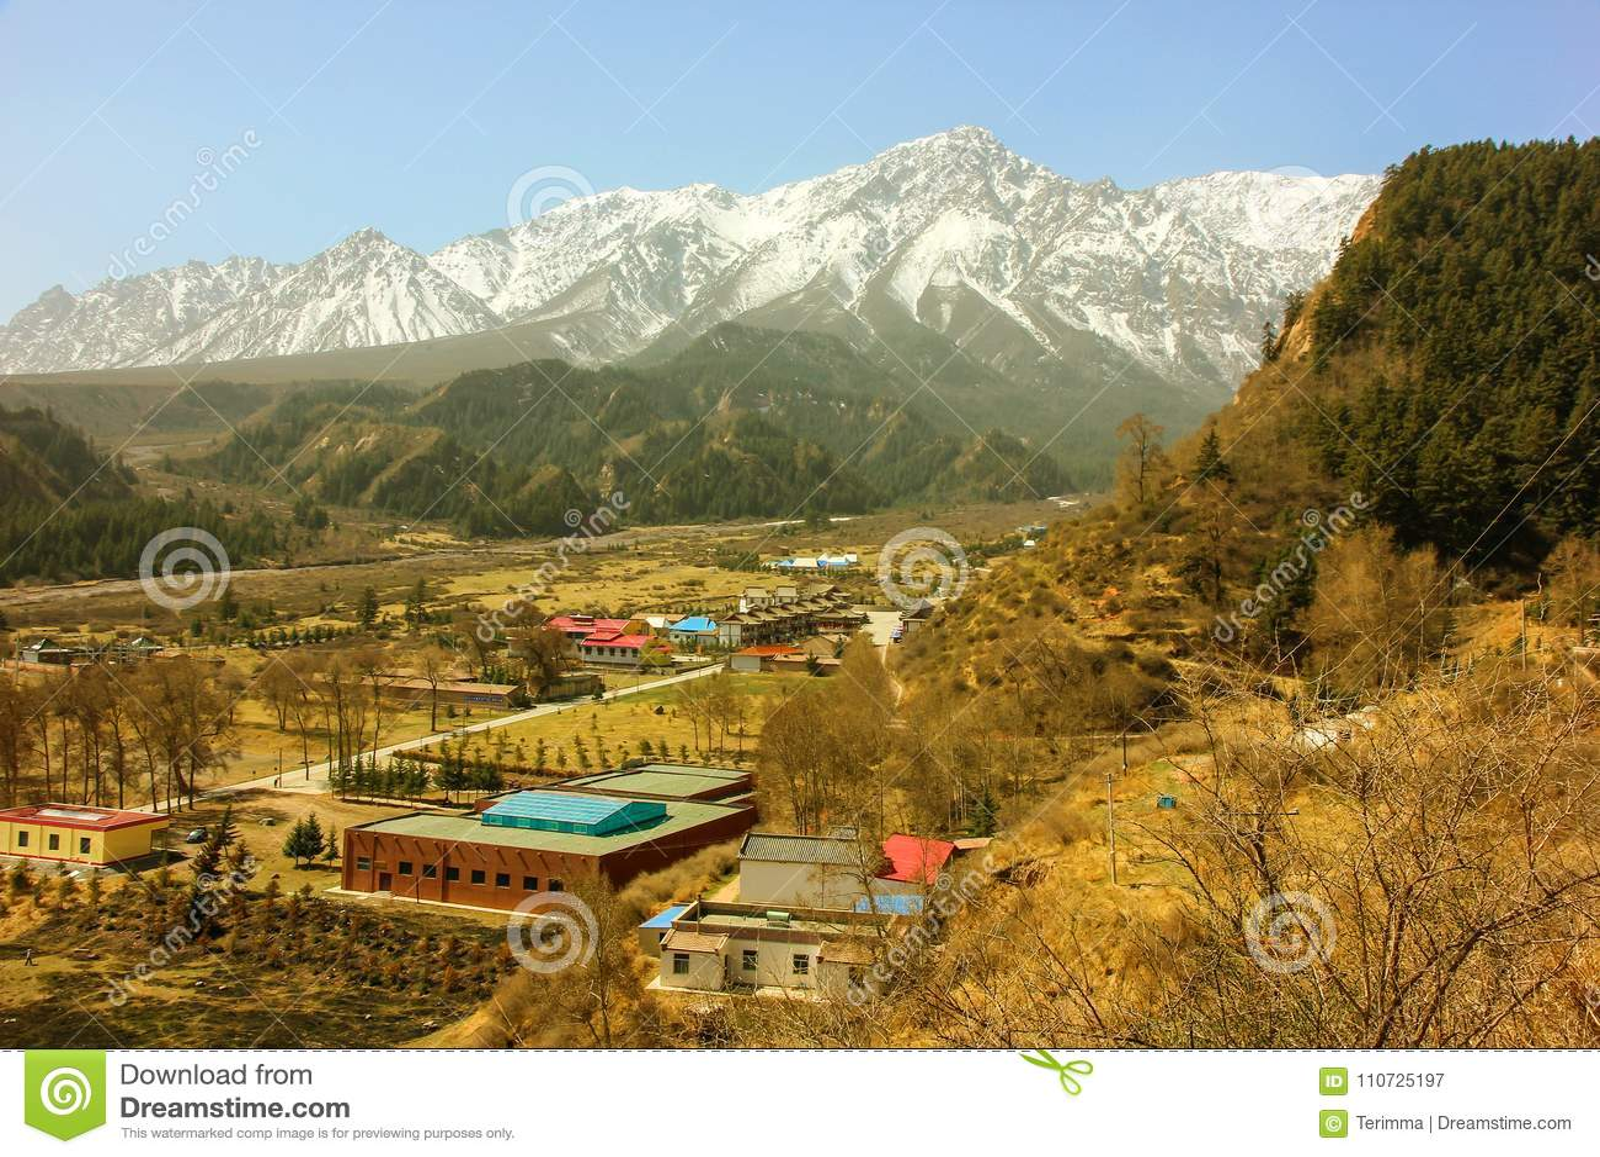 Mati Temple Scenic Area Montagnes de Qilian Shan